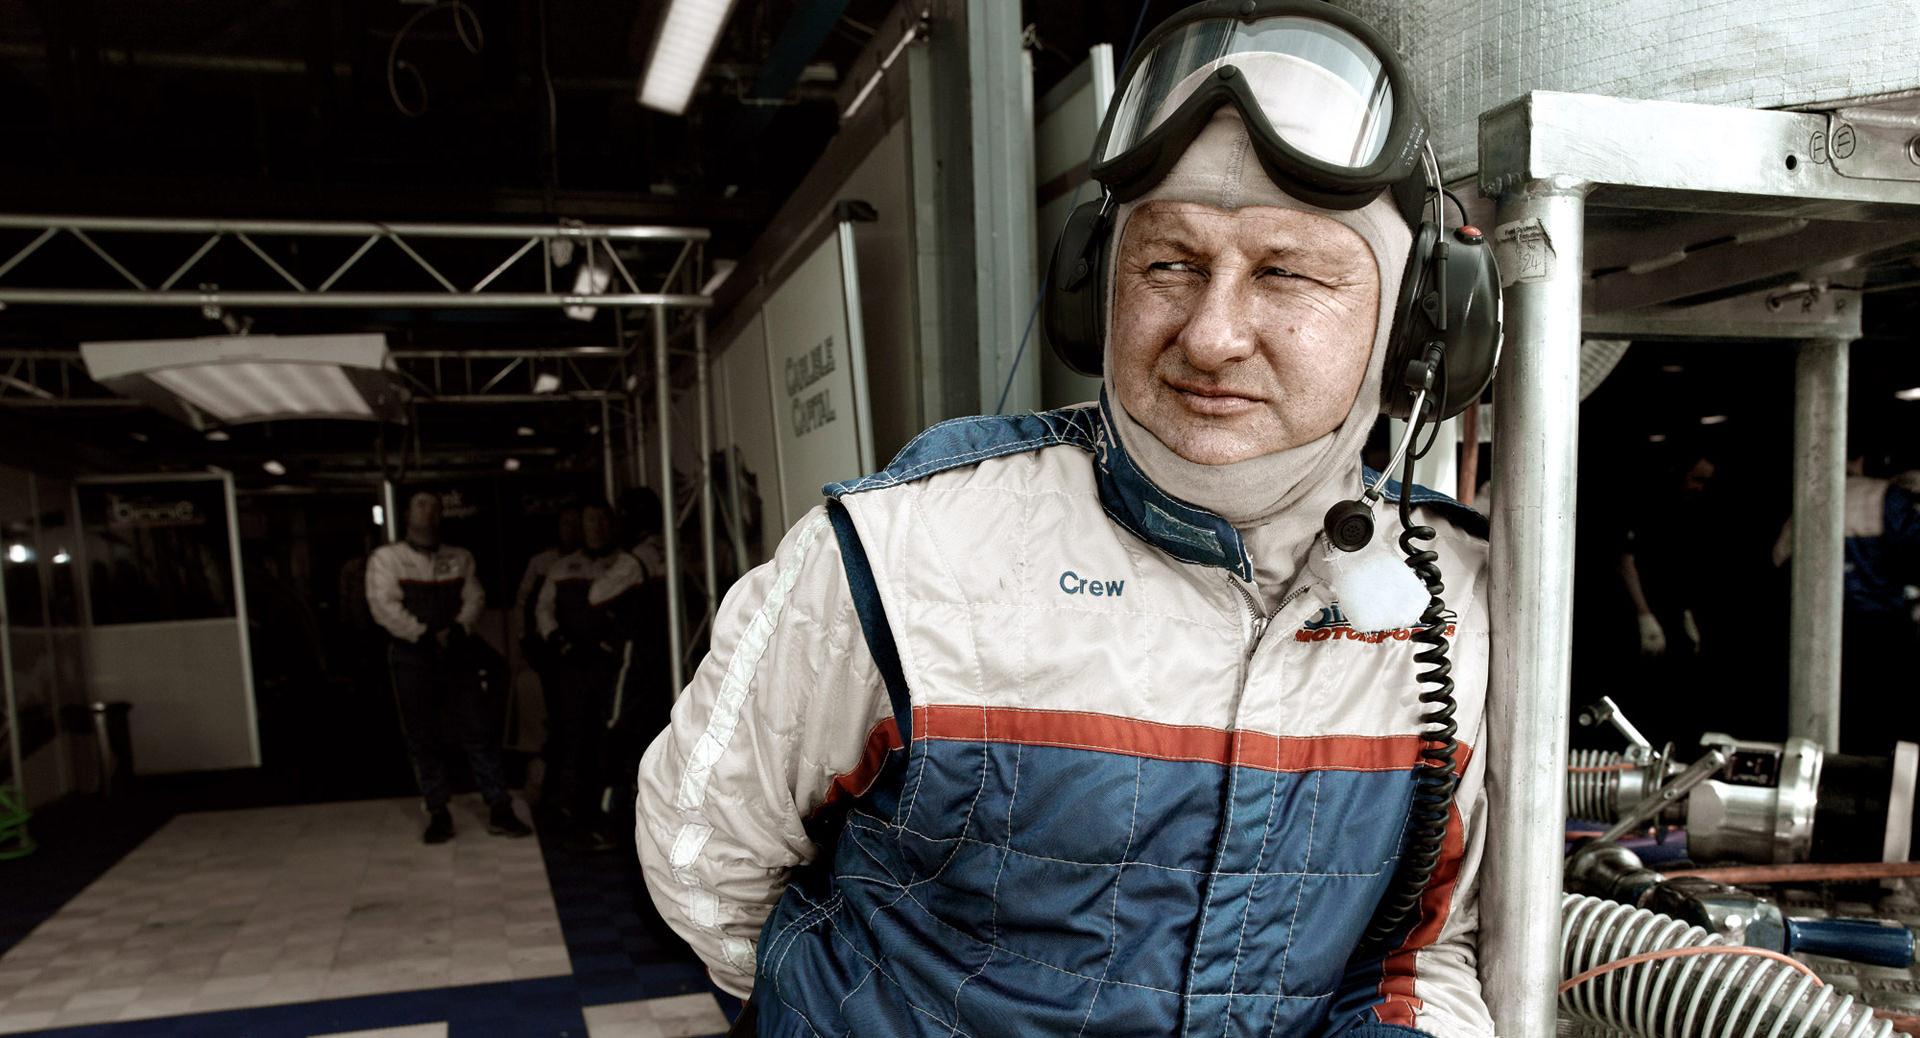 2007 04monza 0314, portrait, www.ankeluckmann.com, anke luckmann, personal work, sport, racing, italy, mechanics, pilots, steno goldstein, monza